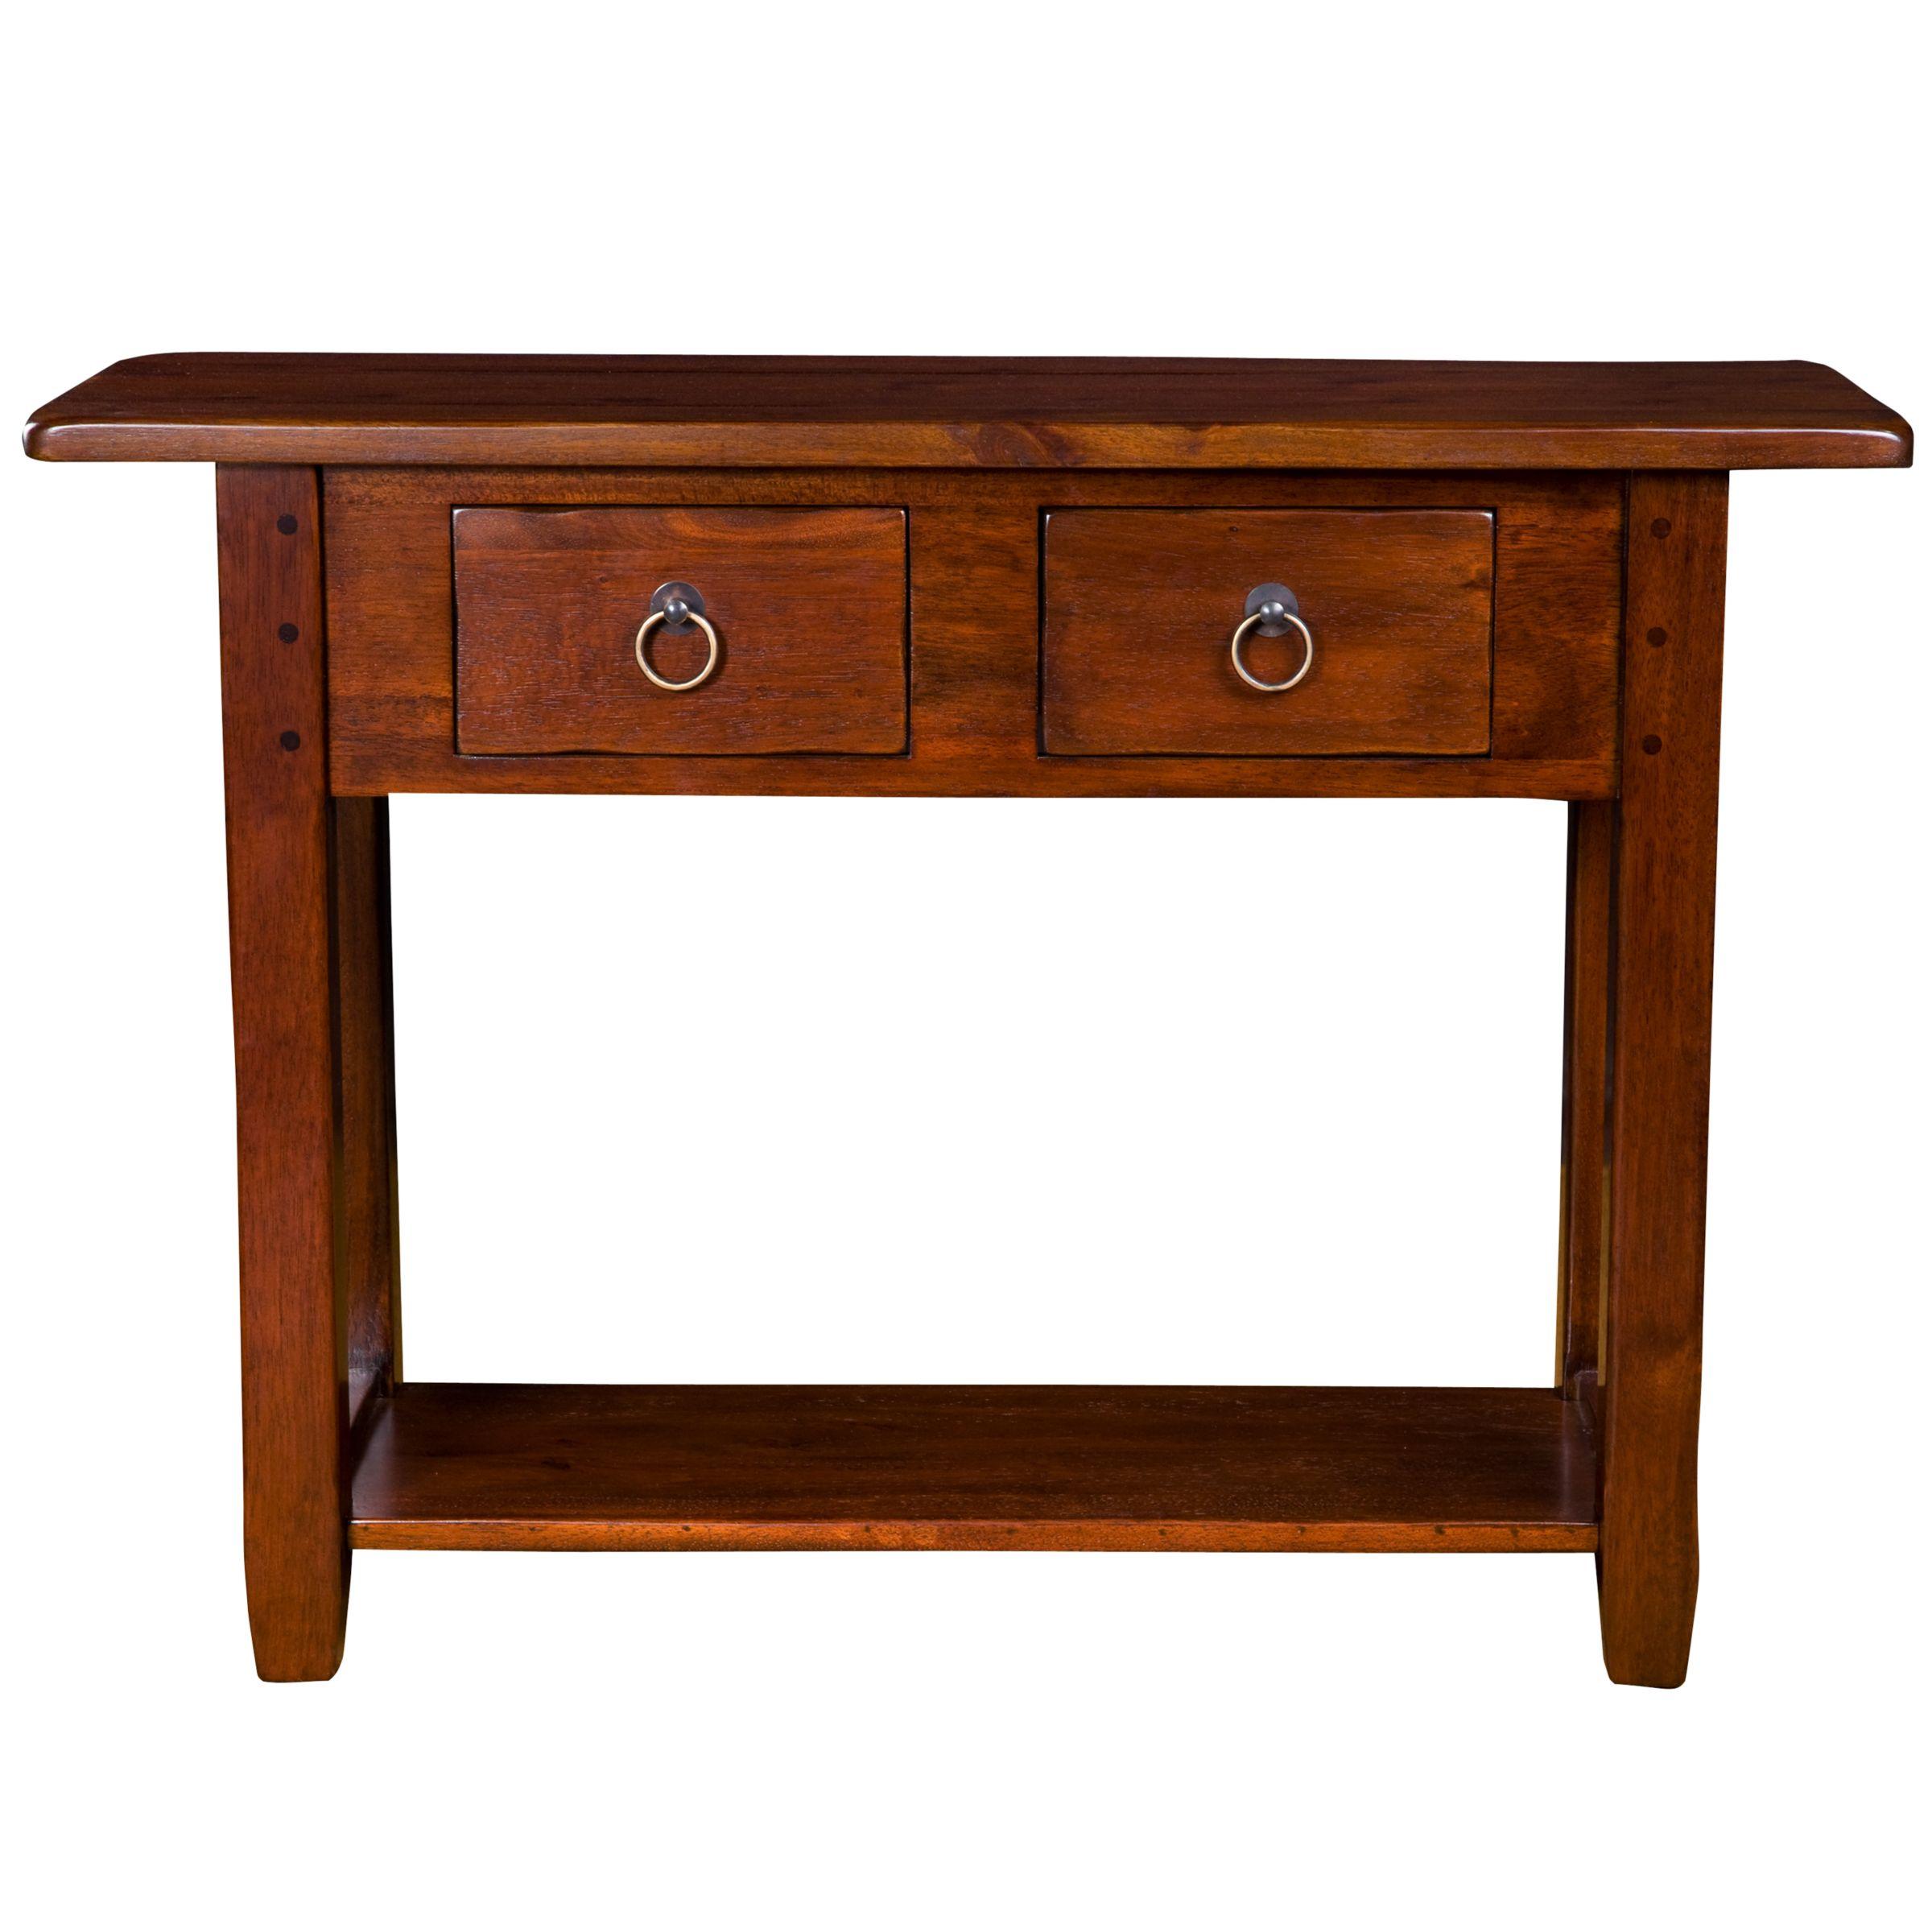 John Lewis Catalogue Store Shop Online at John Lewis  : 230723573 from ukbookshop.chez.com size 1600 x 1600 jpeg 215kB